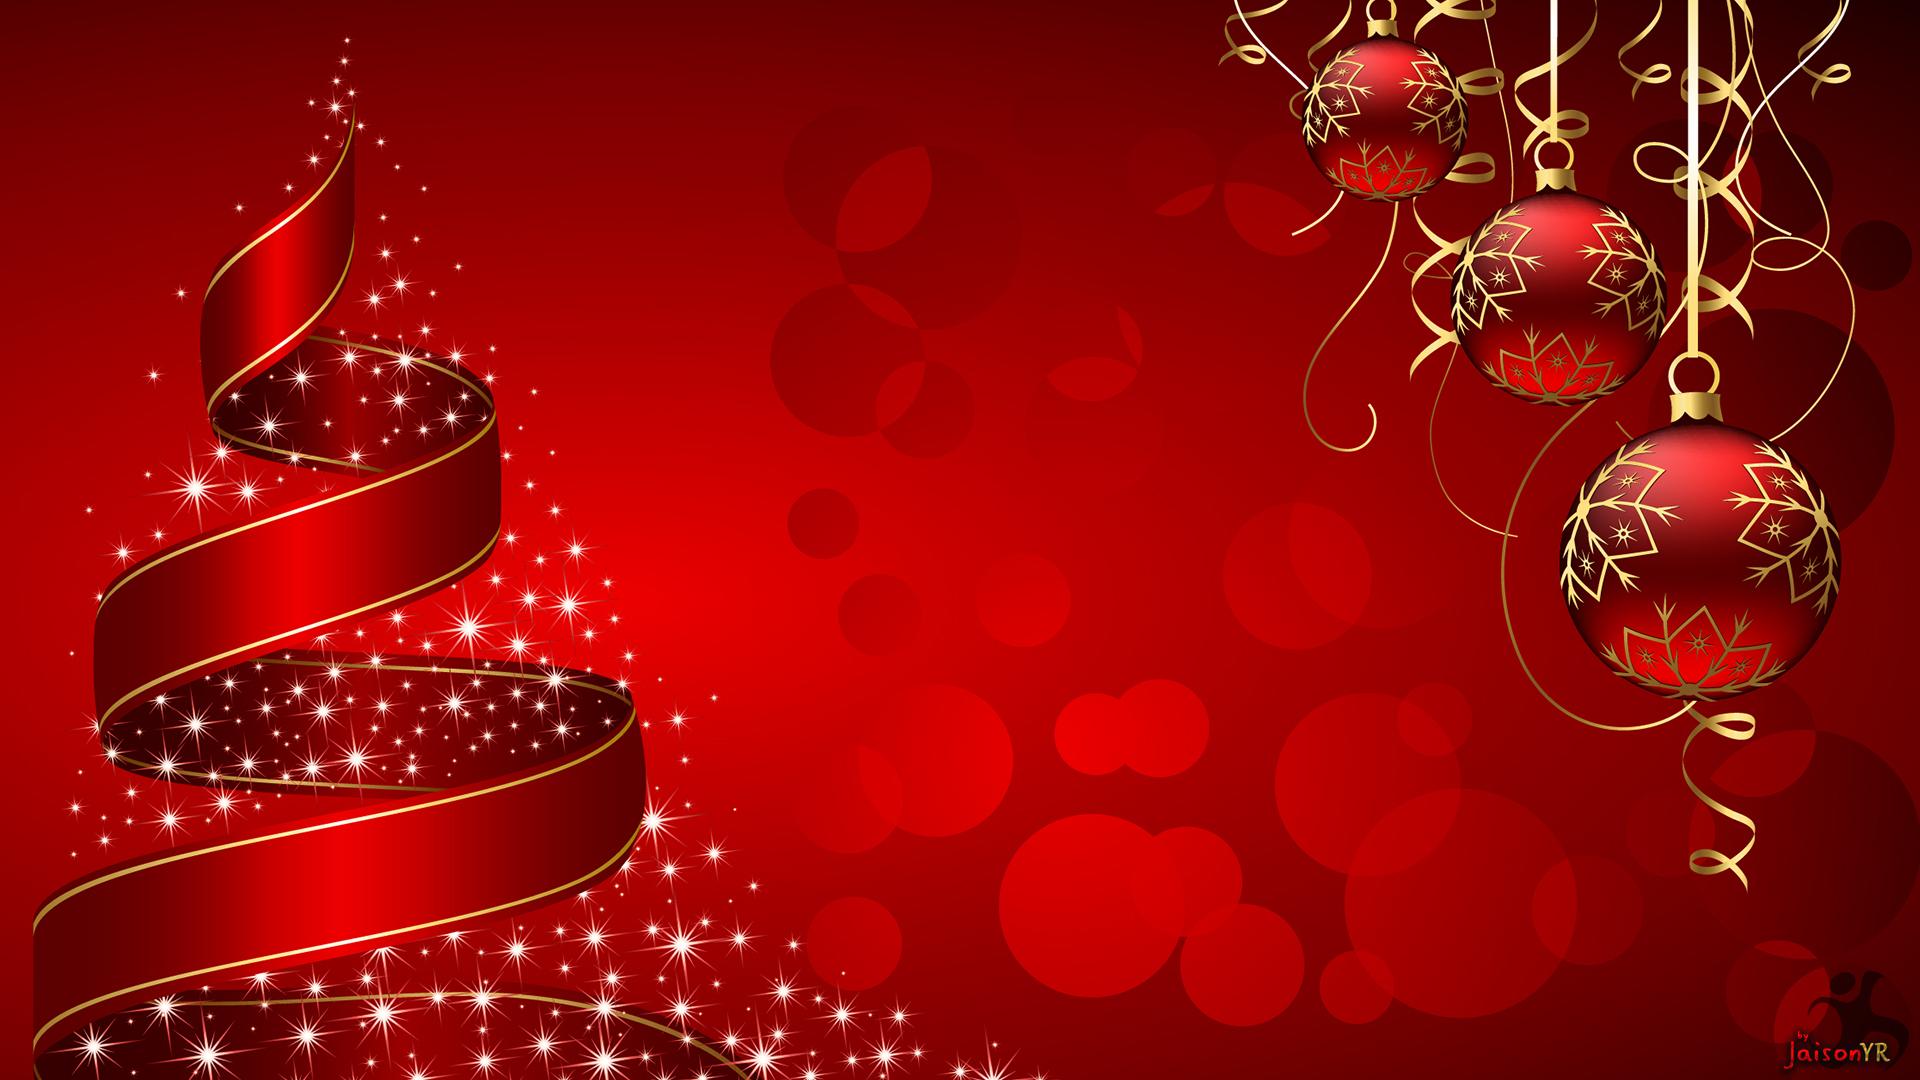 Christmas Tree Wallpaper by JaisonYR 1920x1080